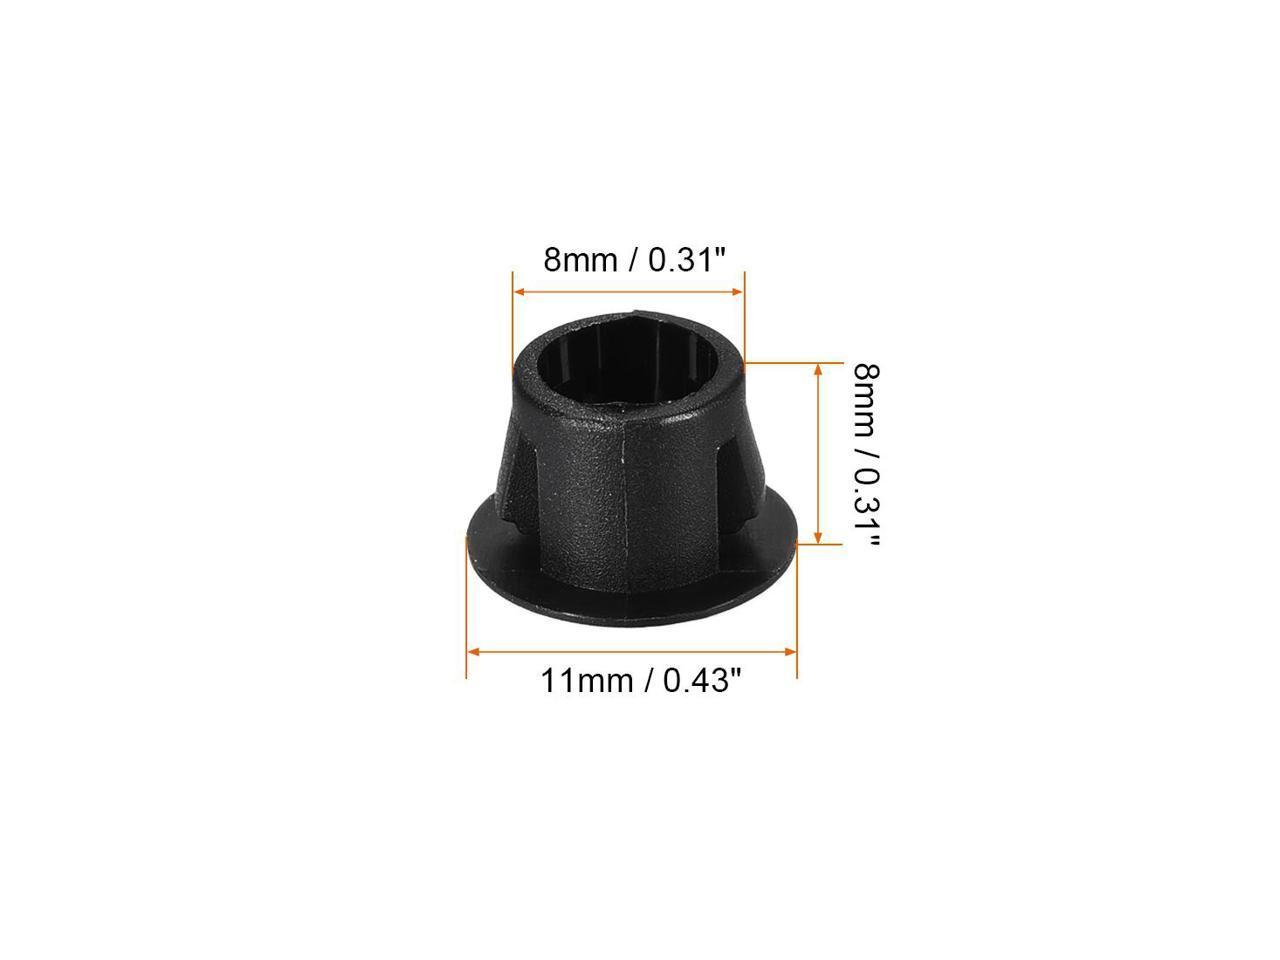 100pcs Mounting 8mm x 8mm Black Nylon Round Snap Panel Locking Hole Plugs Cover